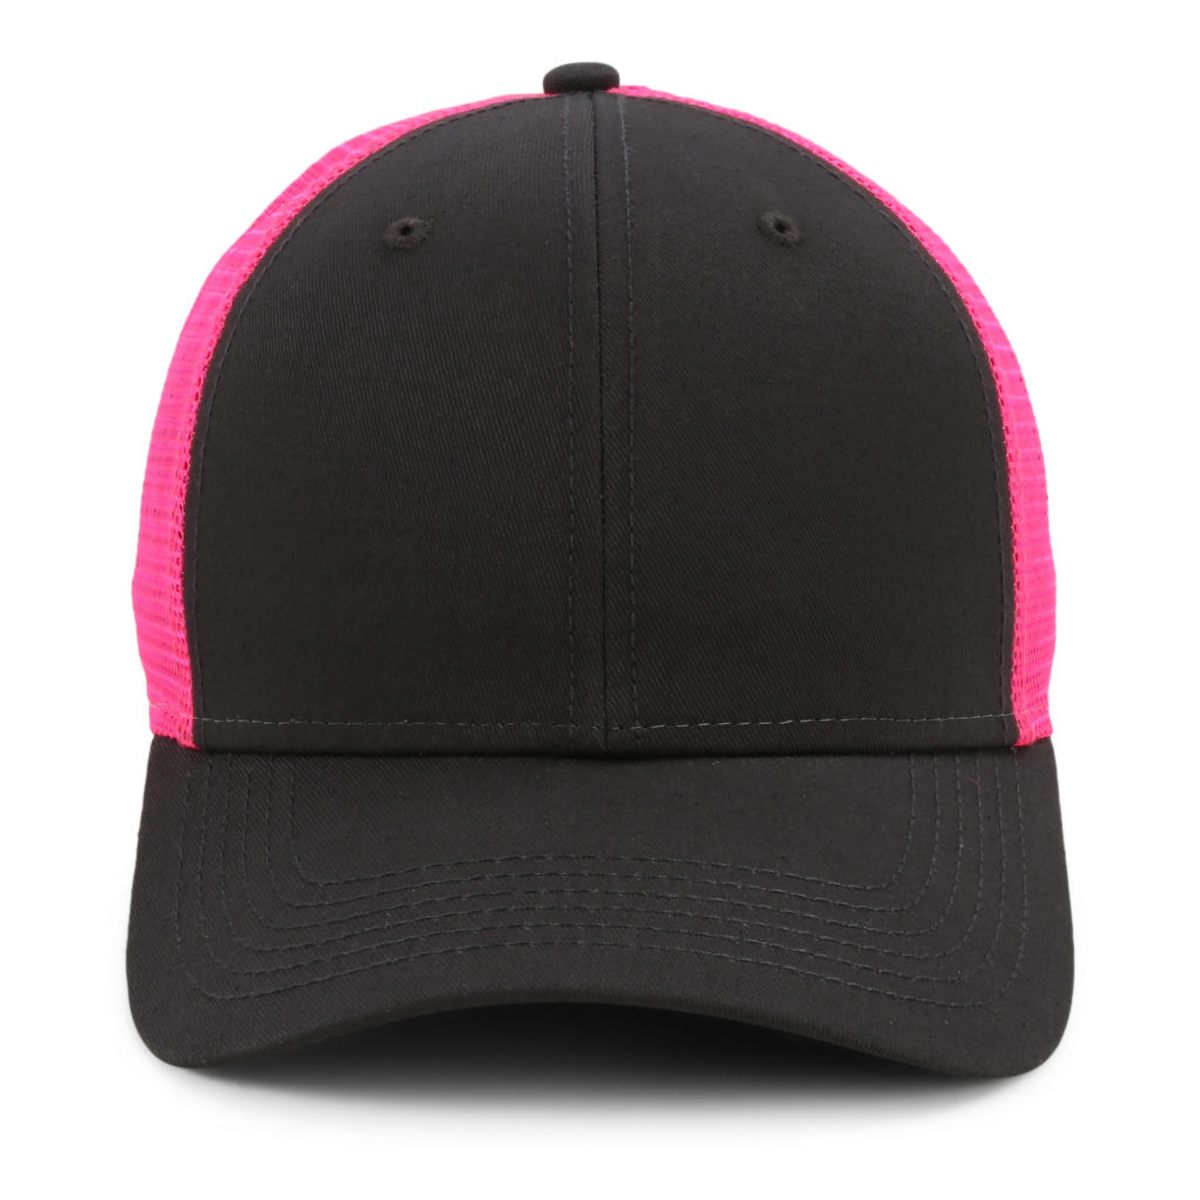 I200m charcoal neon pink 01 1024x1024